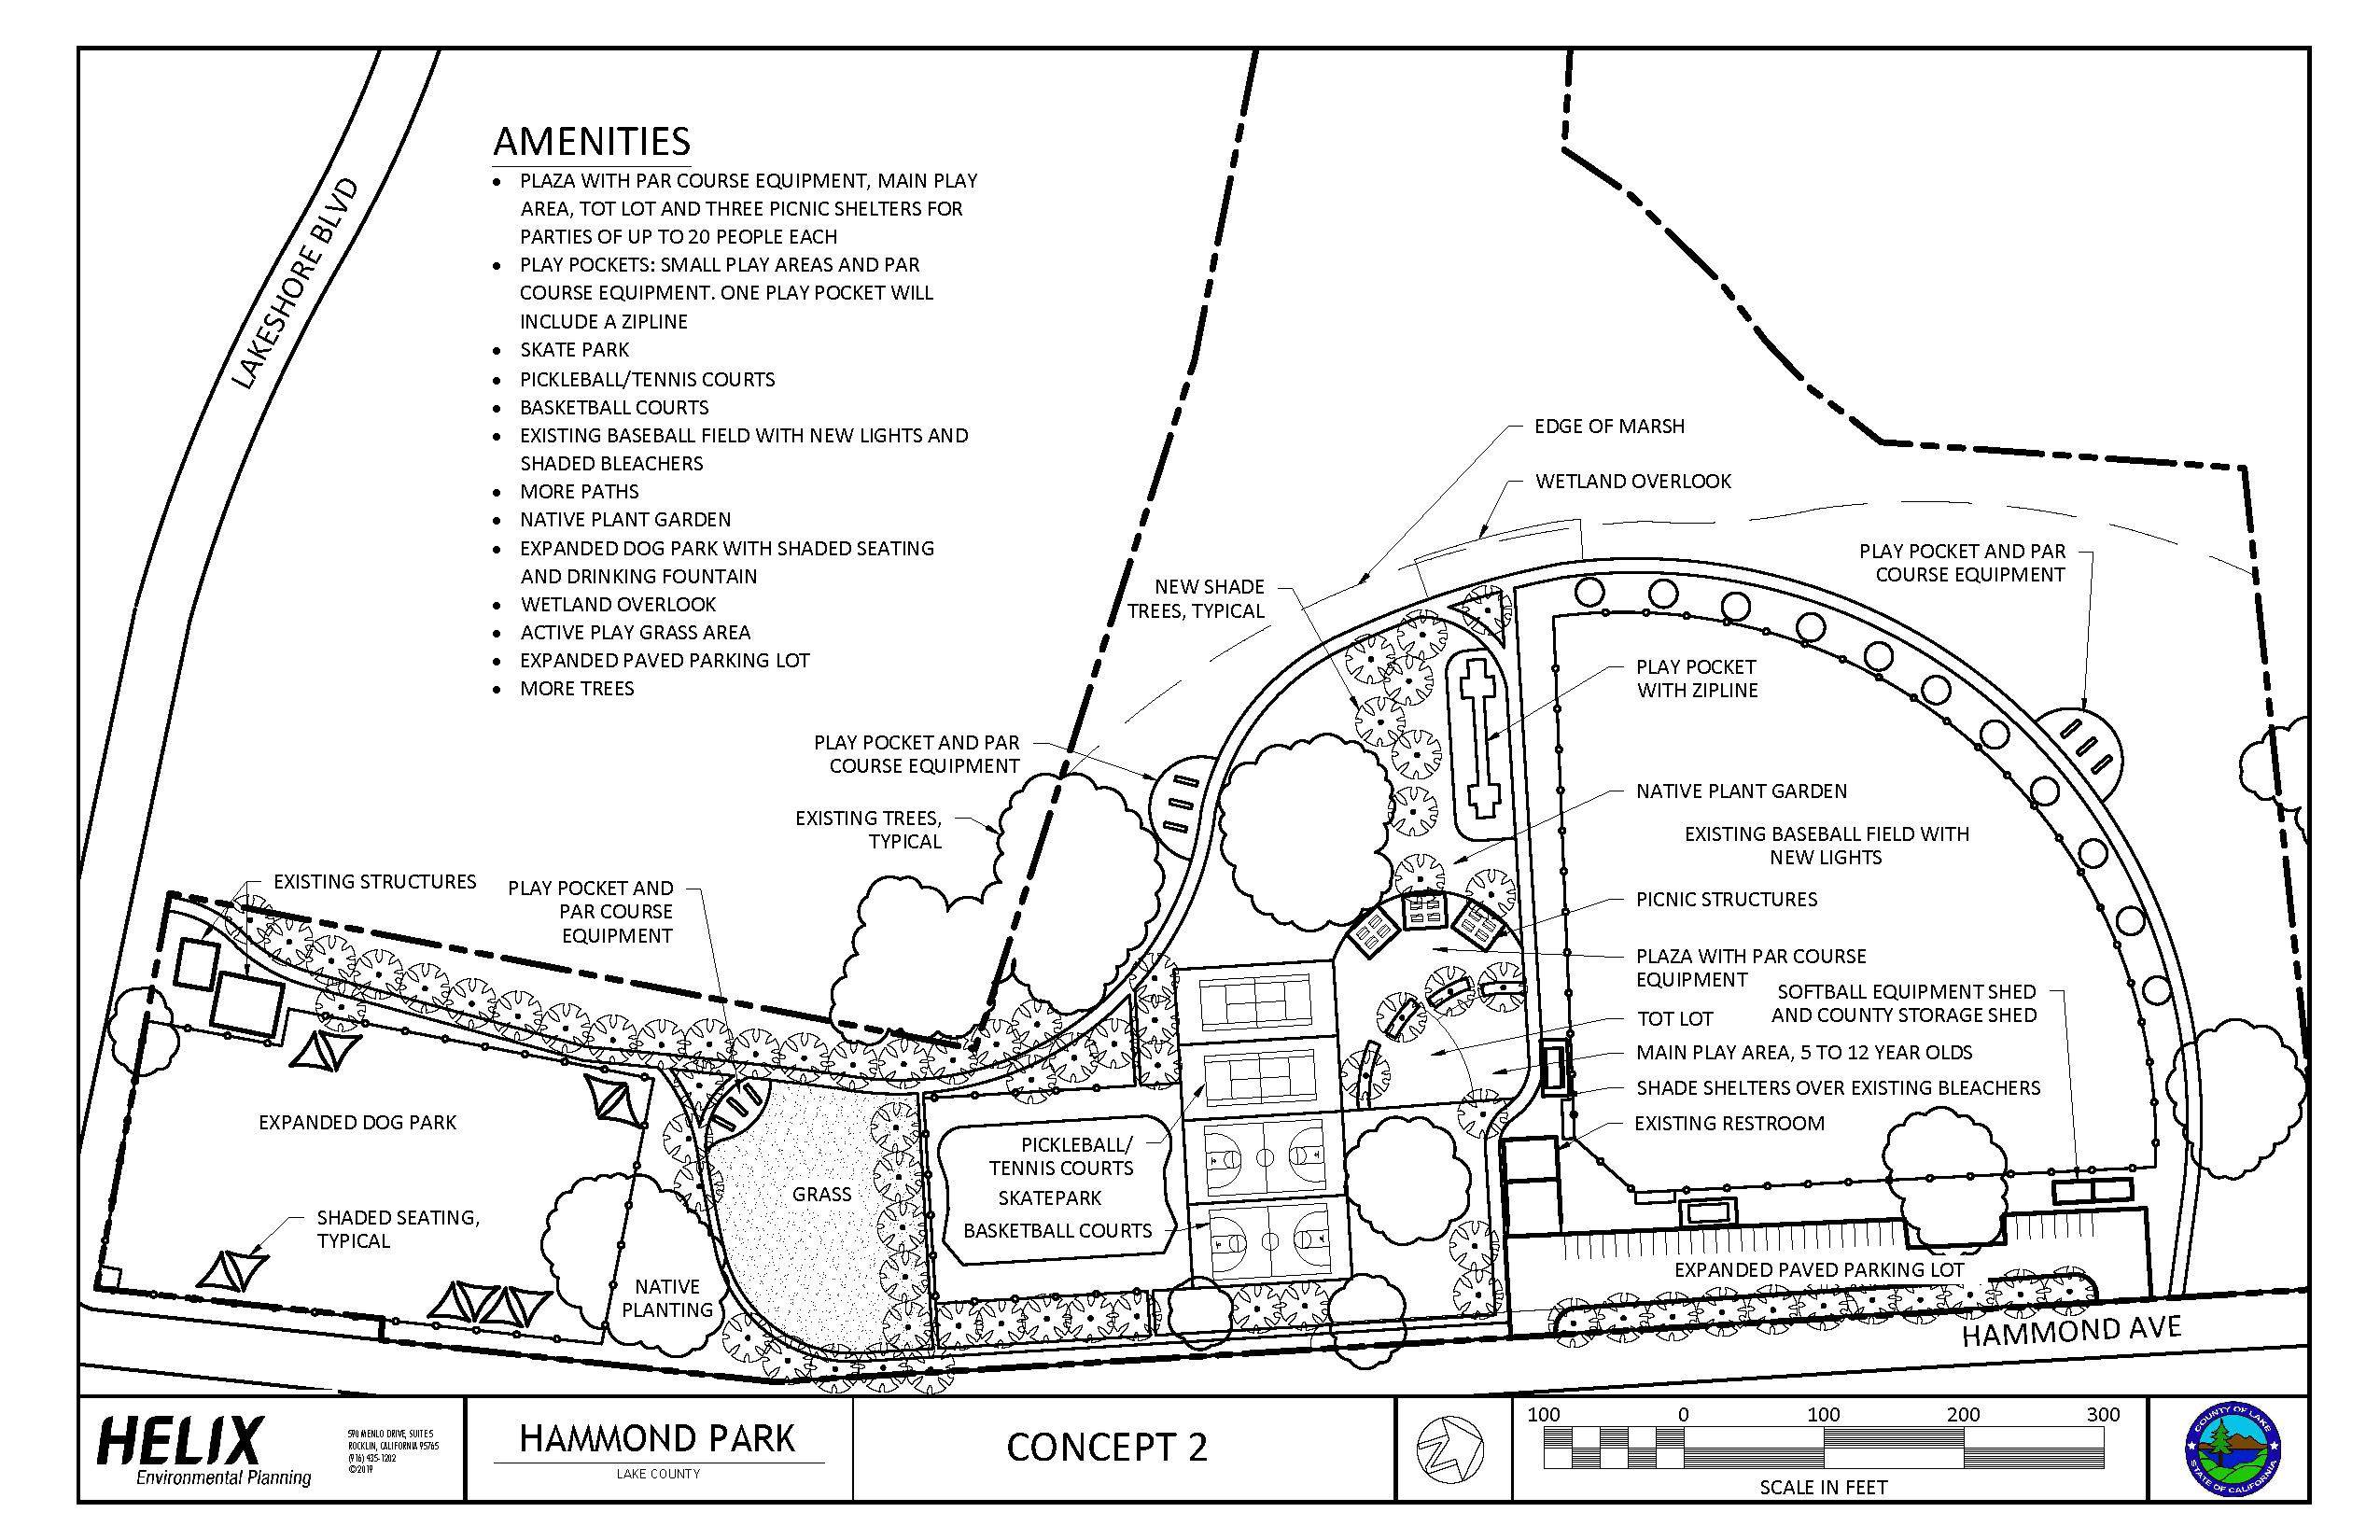 Hammond Park Concept 2